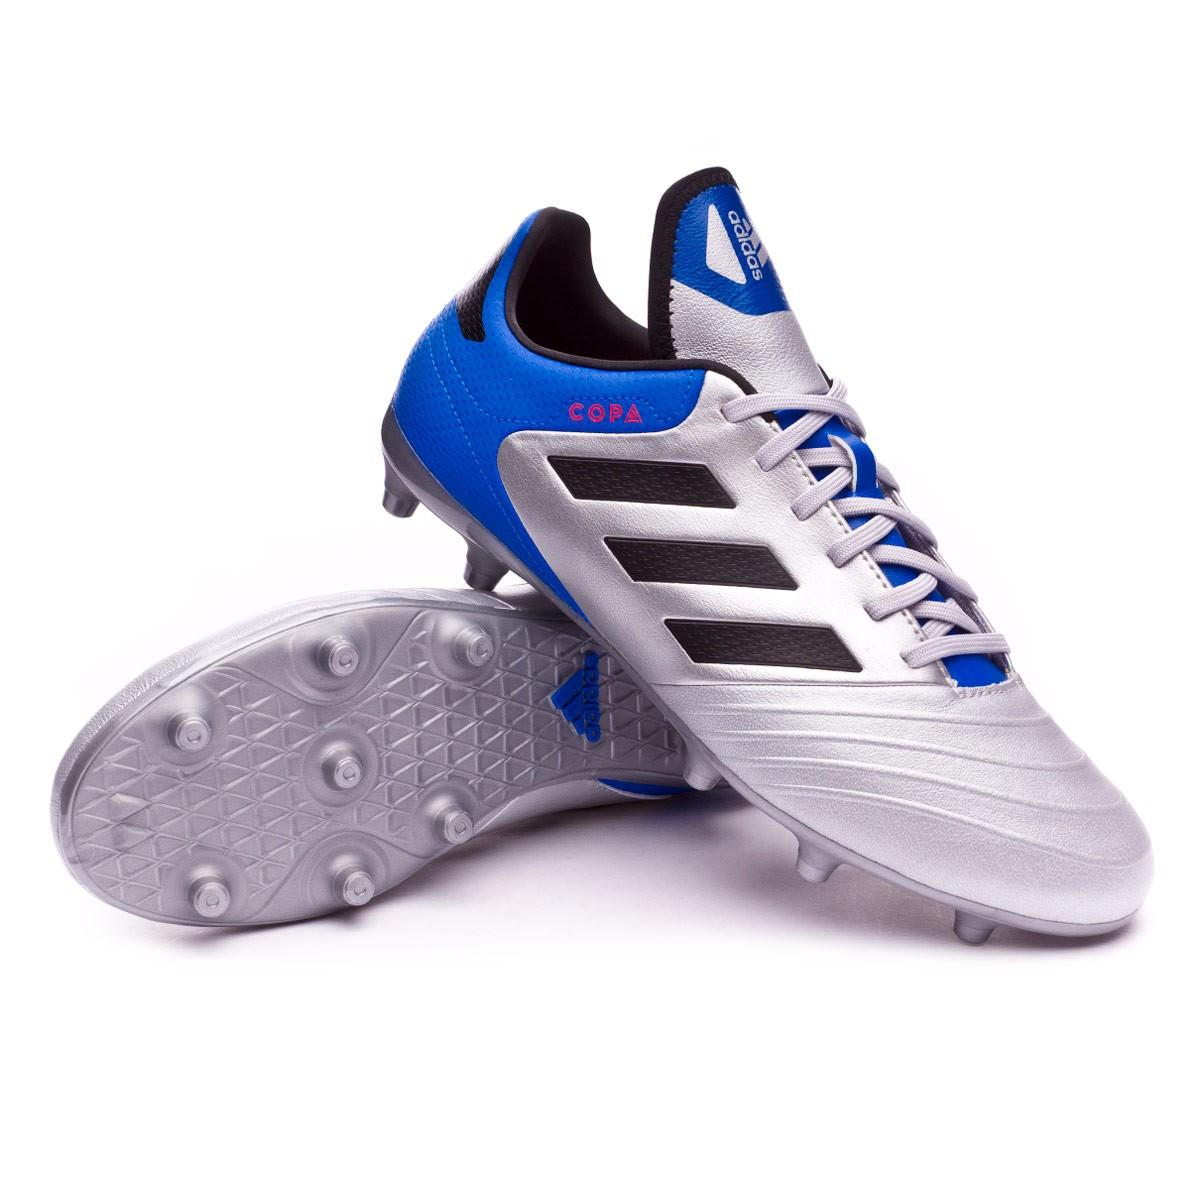 new list buy online the sale of shoes Bota Copa 18.3 FG Silver metallic-Core black-Football blue